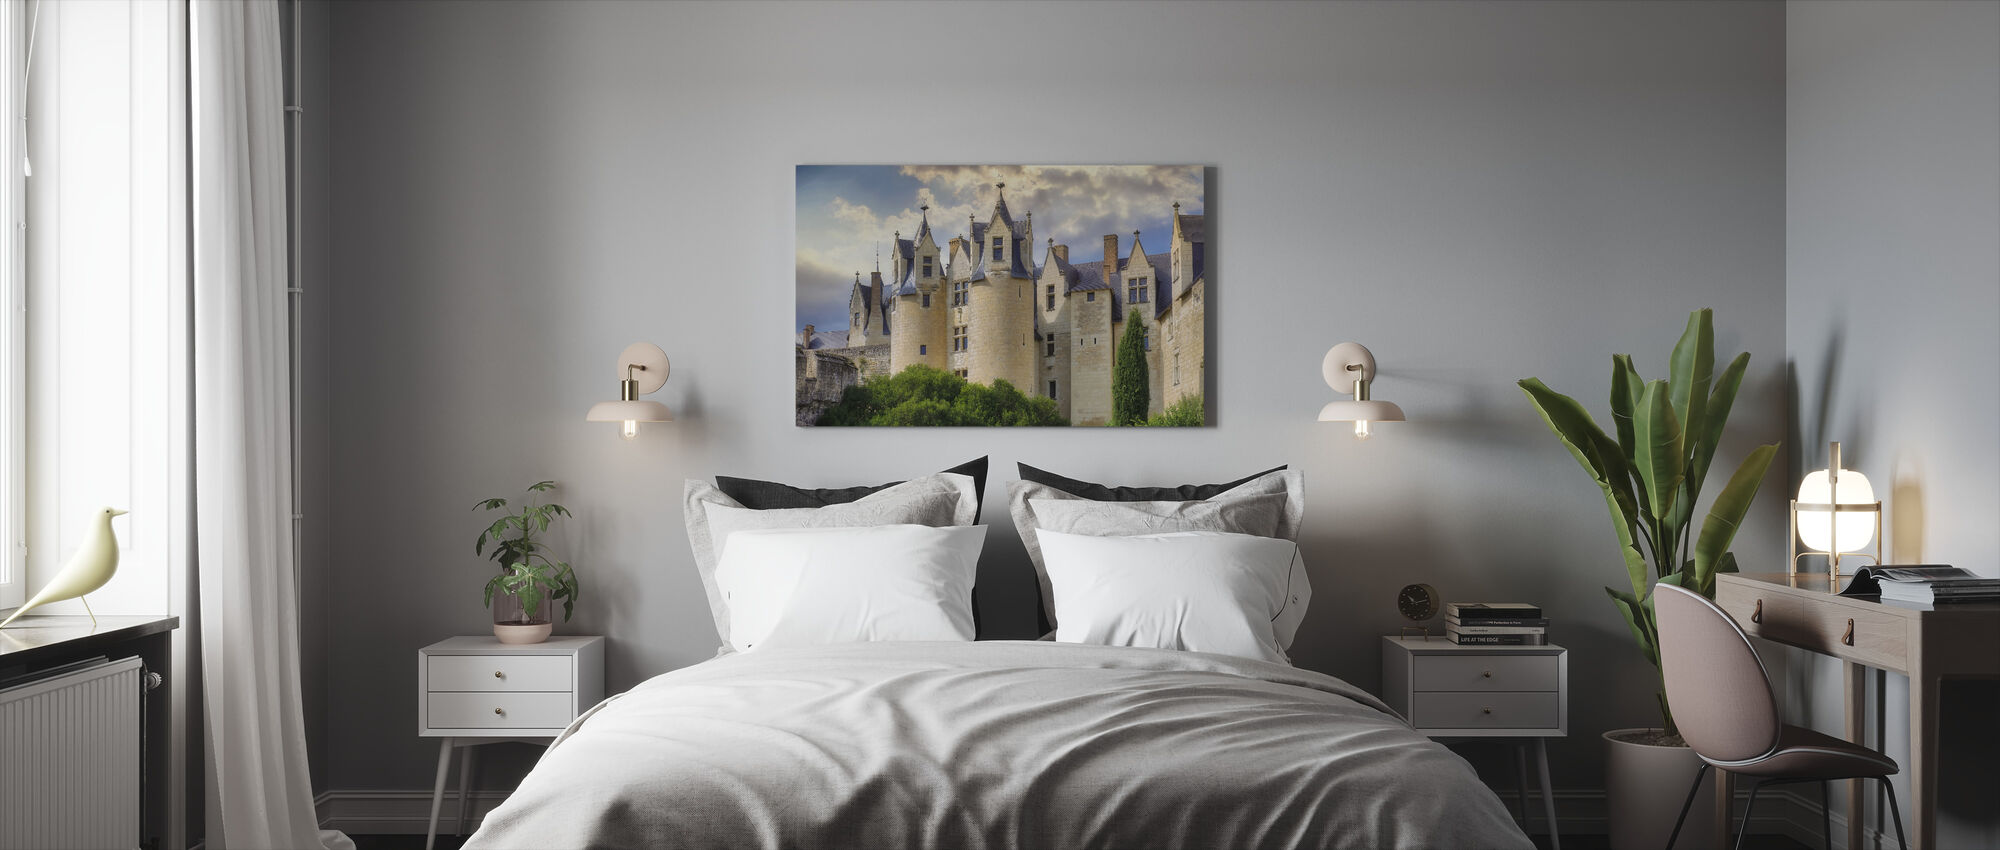 Tower Castle - Canvas print - Bedroom